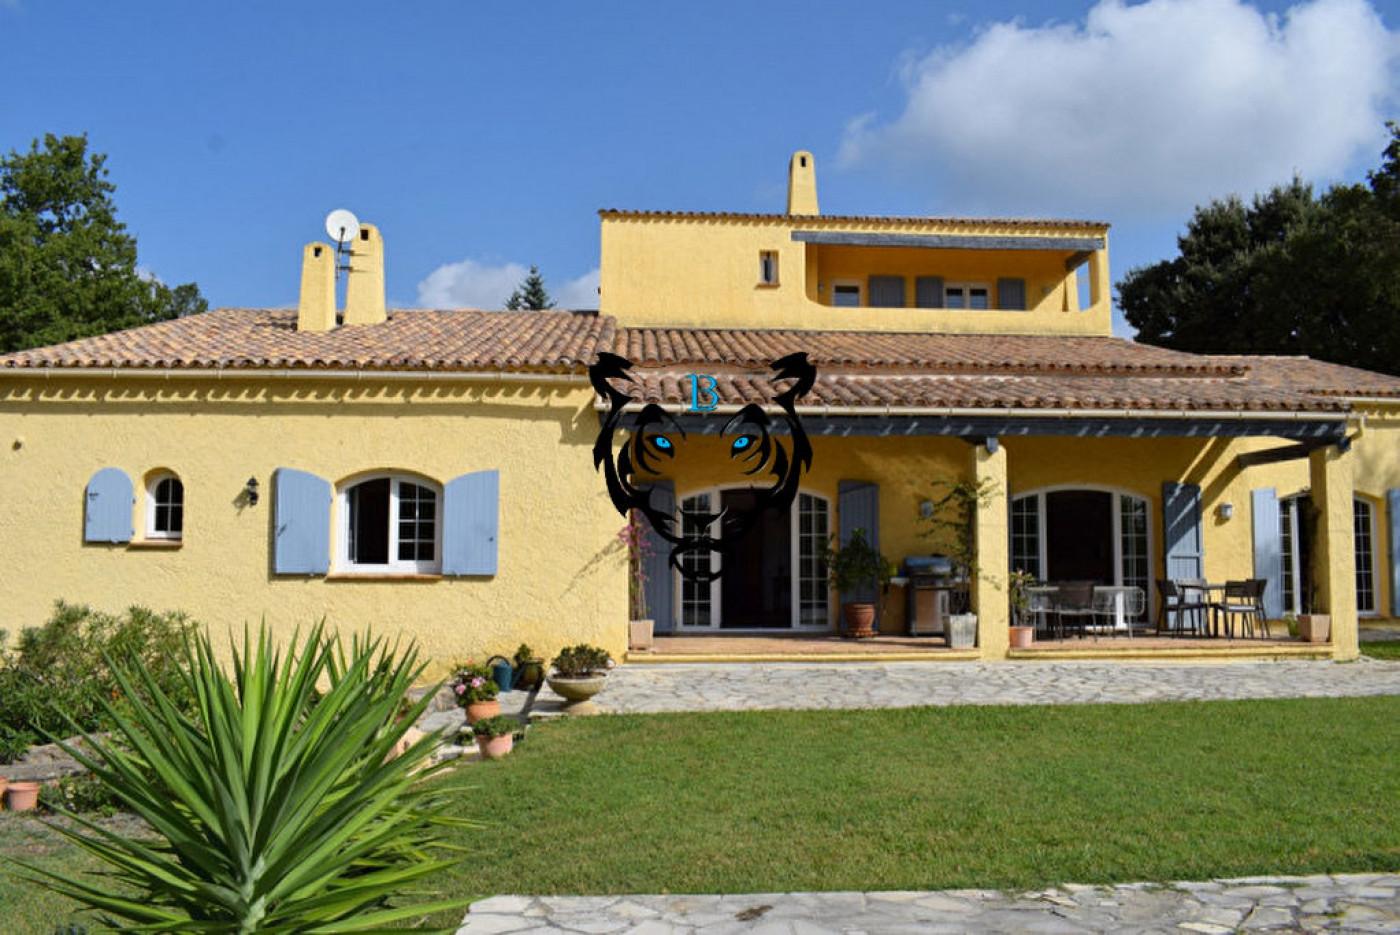 A vendre  Bagnols En Foret | Réf 830213715 - Benicimmo